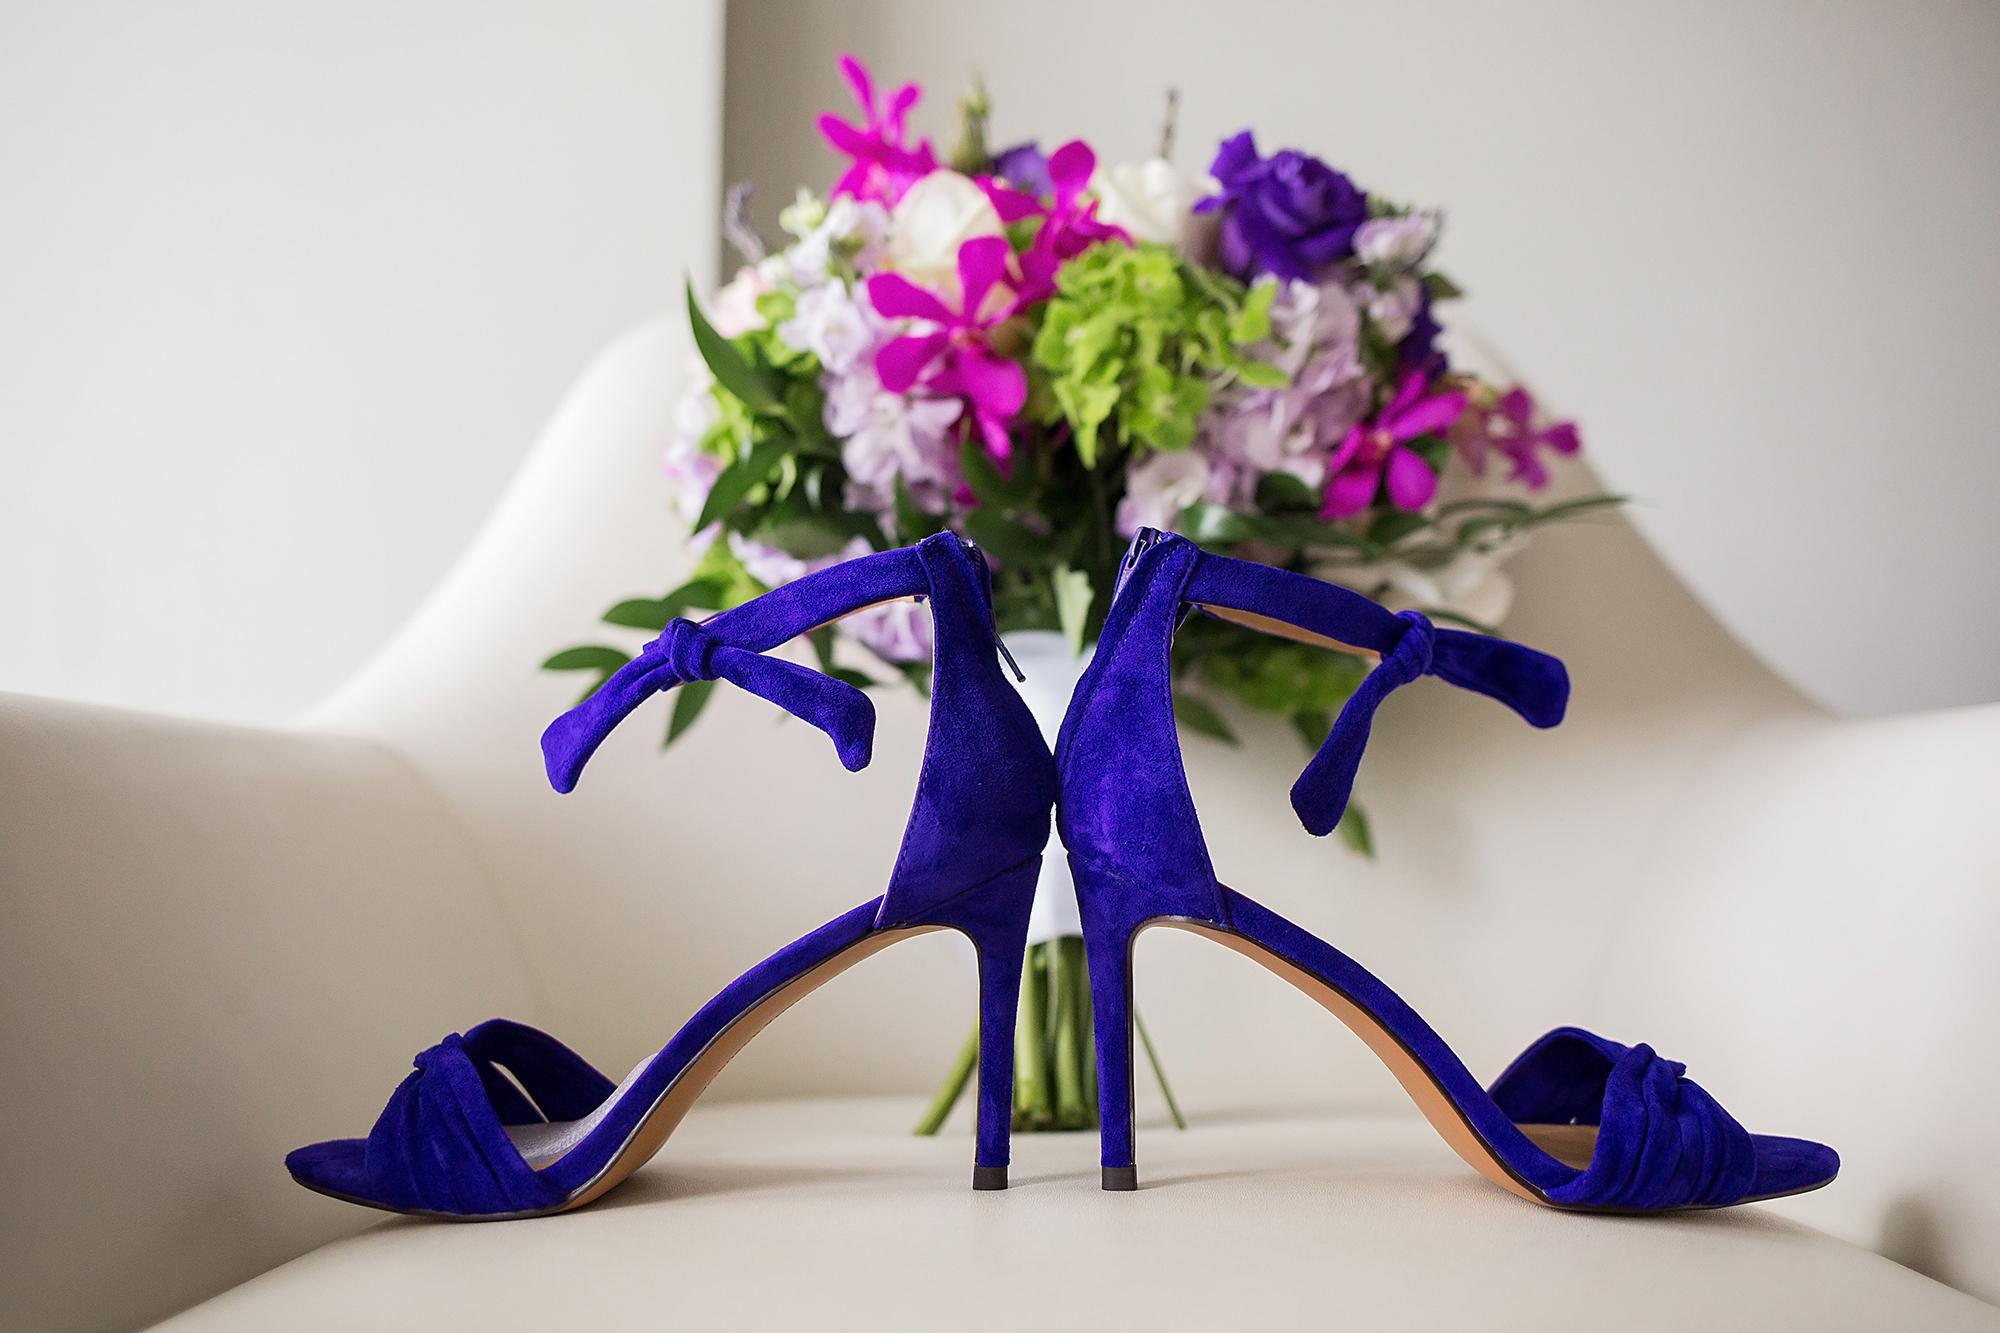 purple-wedding-shoes.jpg